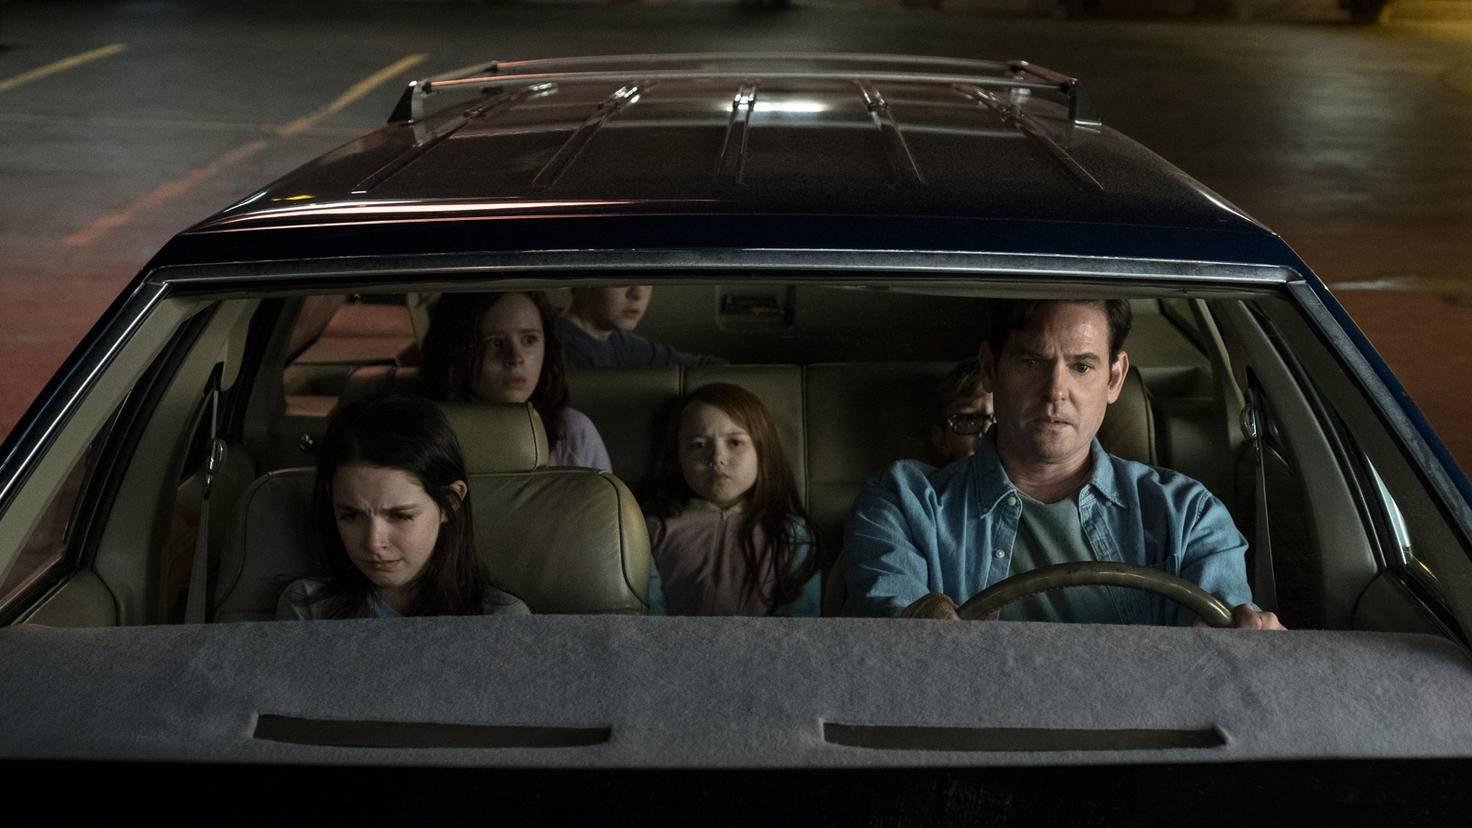 The Haunting of Hill House-S1E5-McKenny Grace-Lulu Wilson-Paxton Singleton-Violet Mcgraw-Julian Hillard-Henry Thomas-Steve Dietl-Netflix